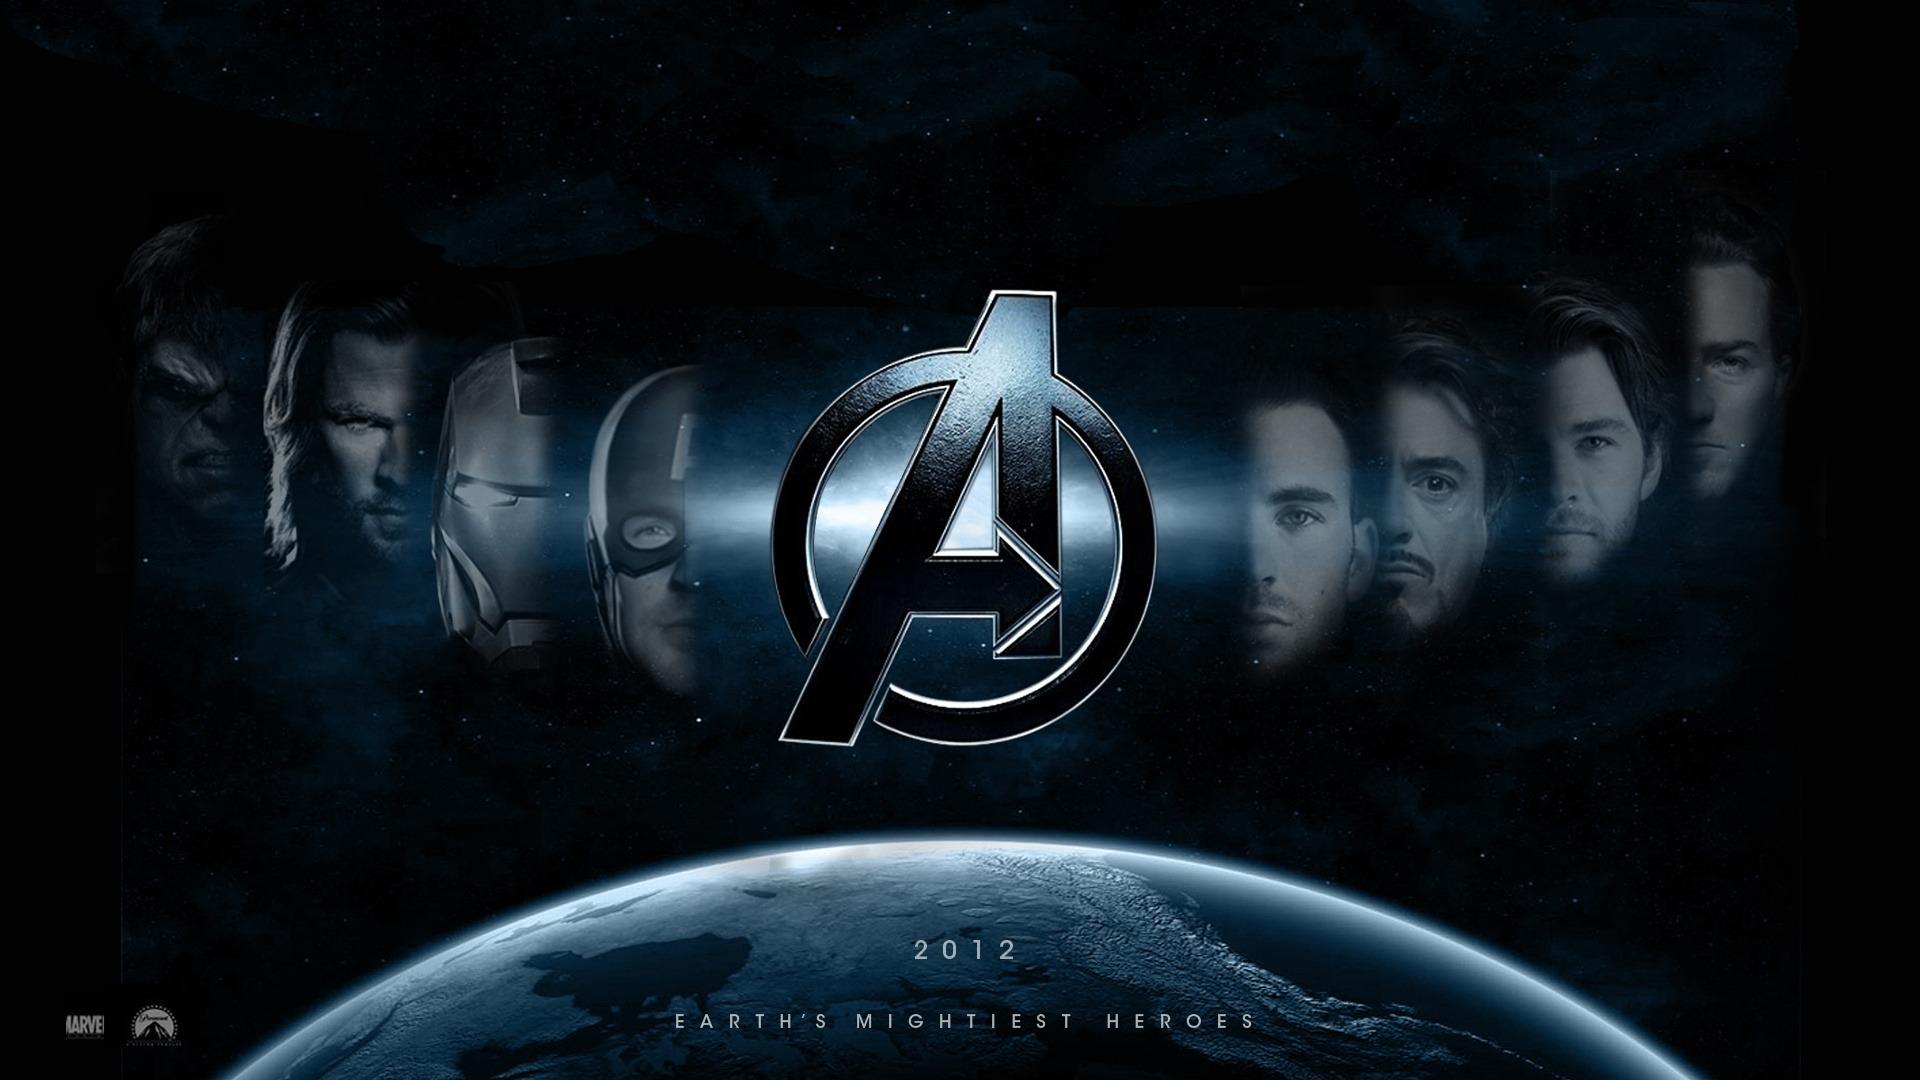 The Avengers 2012 HD Movie Desktop Wallpaper-1920x1080 ...